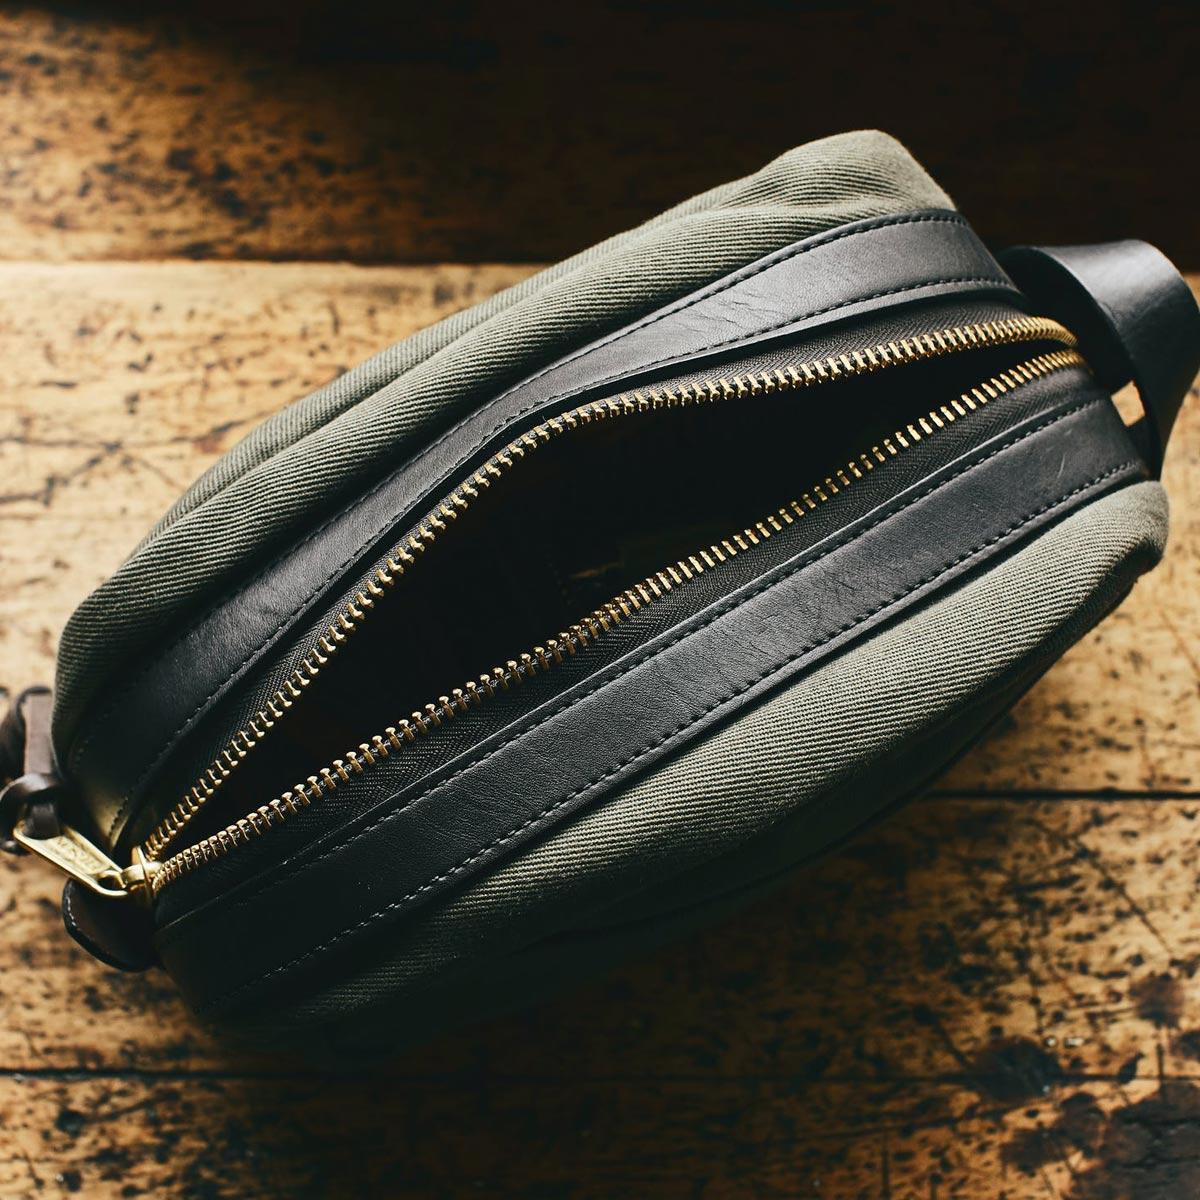 Filson Travel Kit 11070218-Otter Green, stijlvolle travel-kit voor iedere trip die jij gaat maken